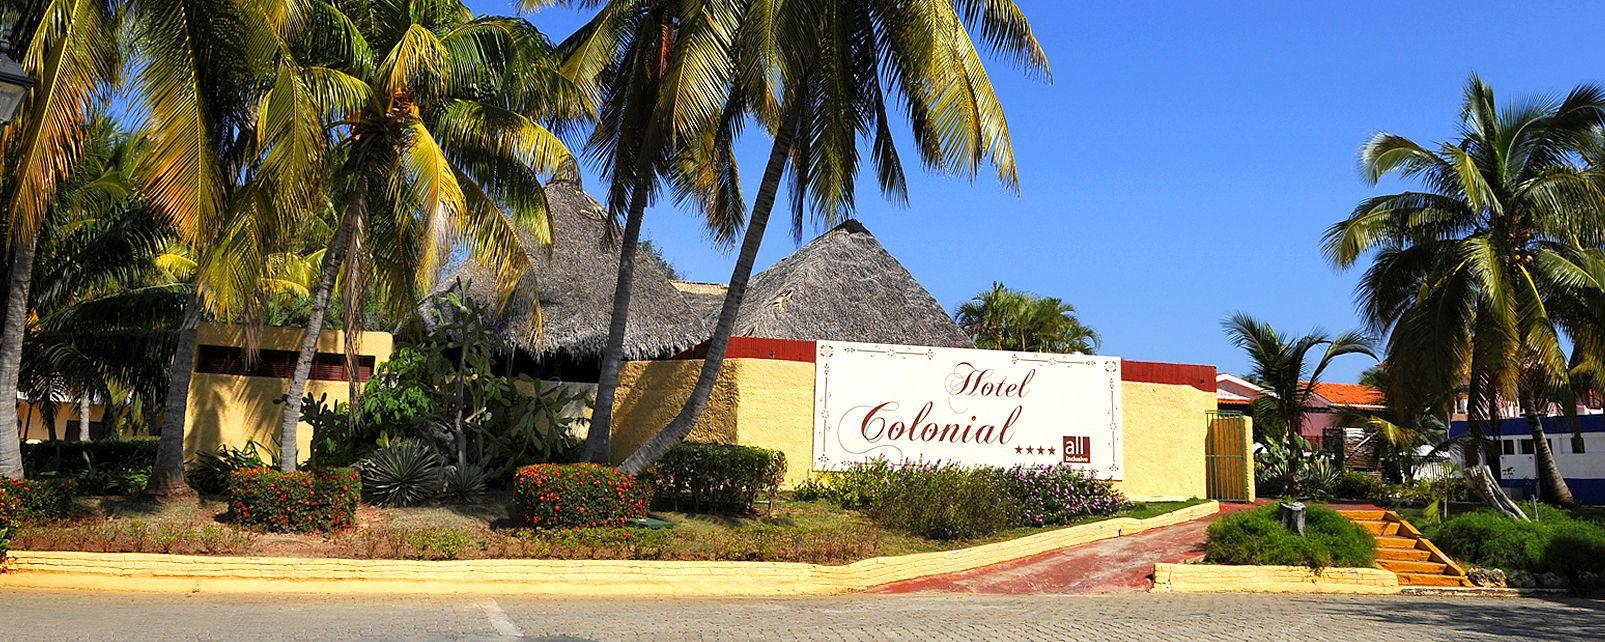 Hôtel Colonial